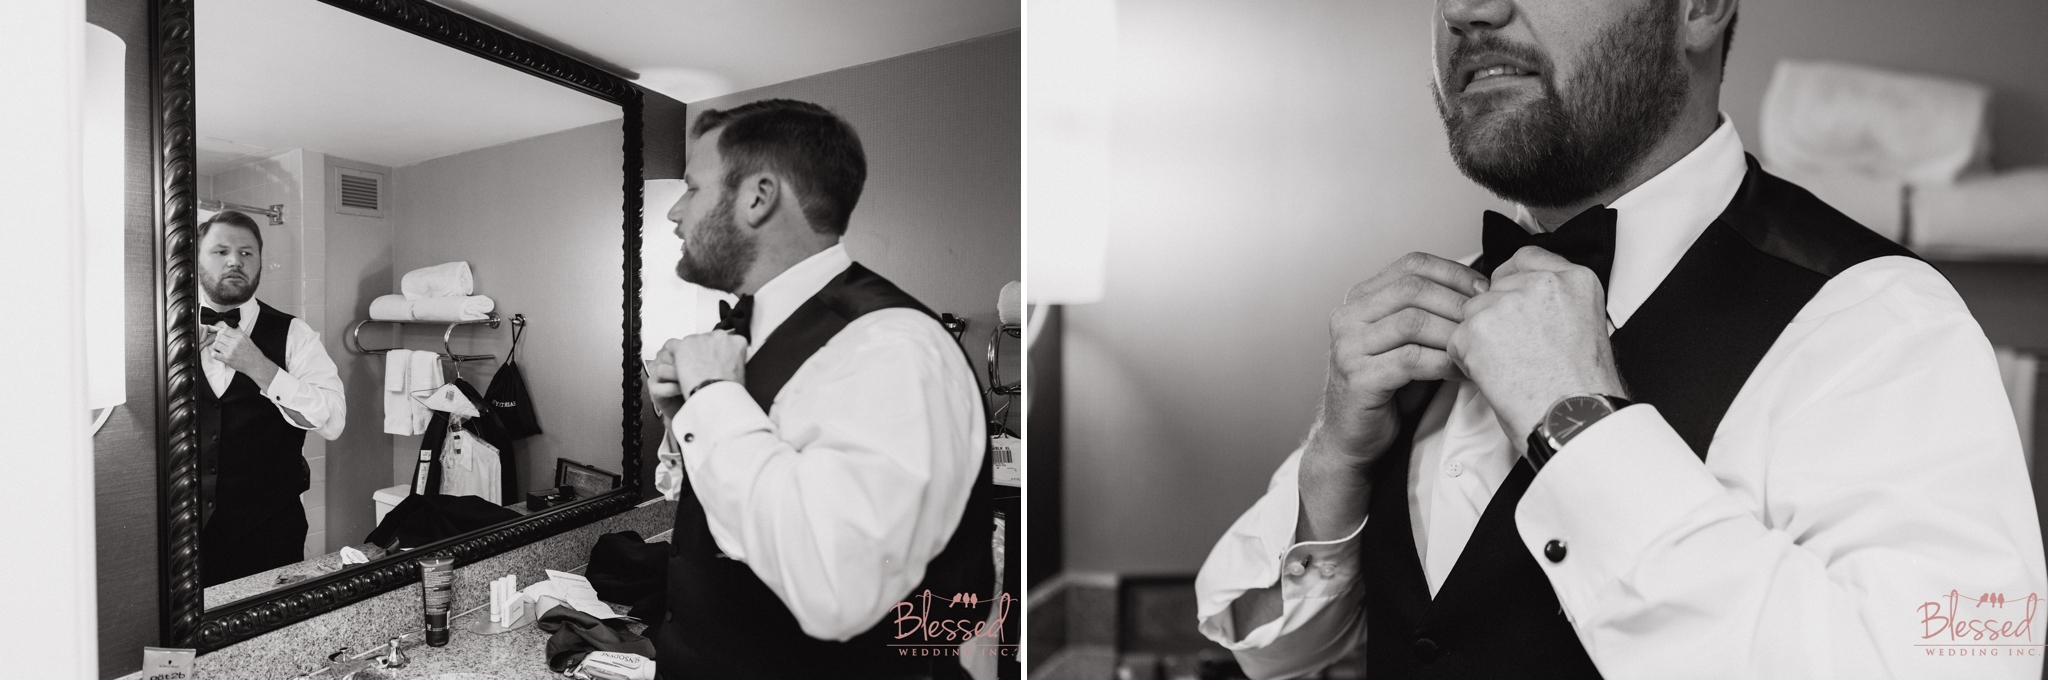 Orfila Vinery Wedding by Blessed Wedding Photography 15.jpg